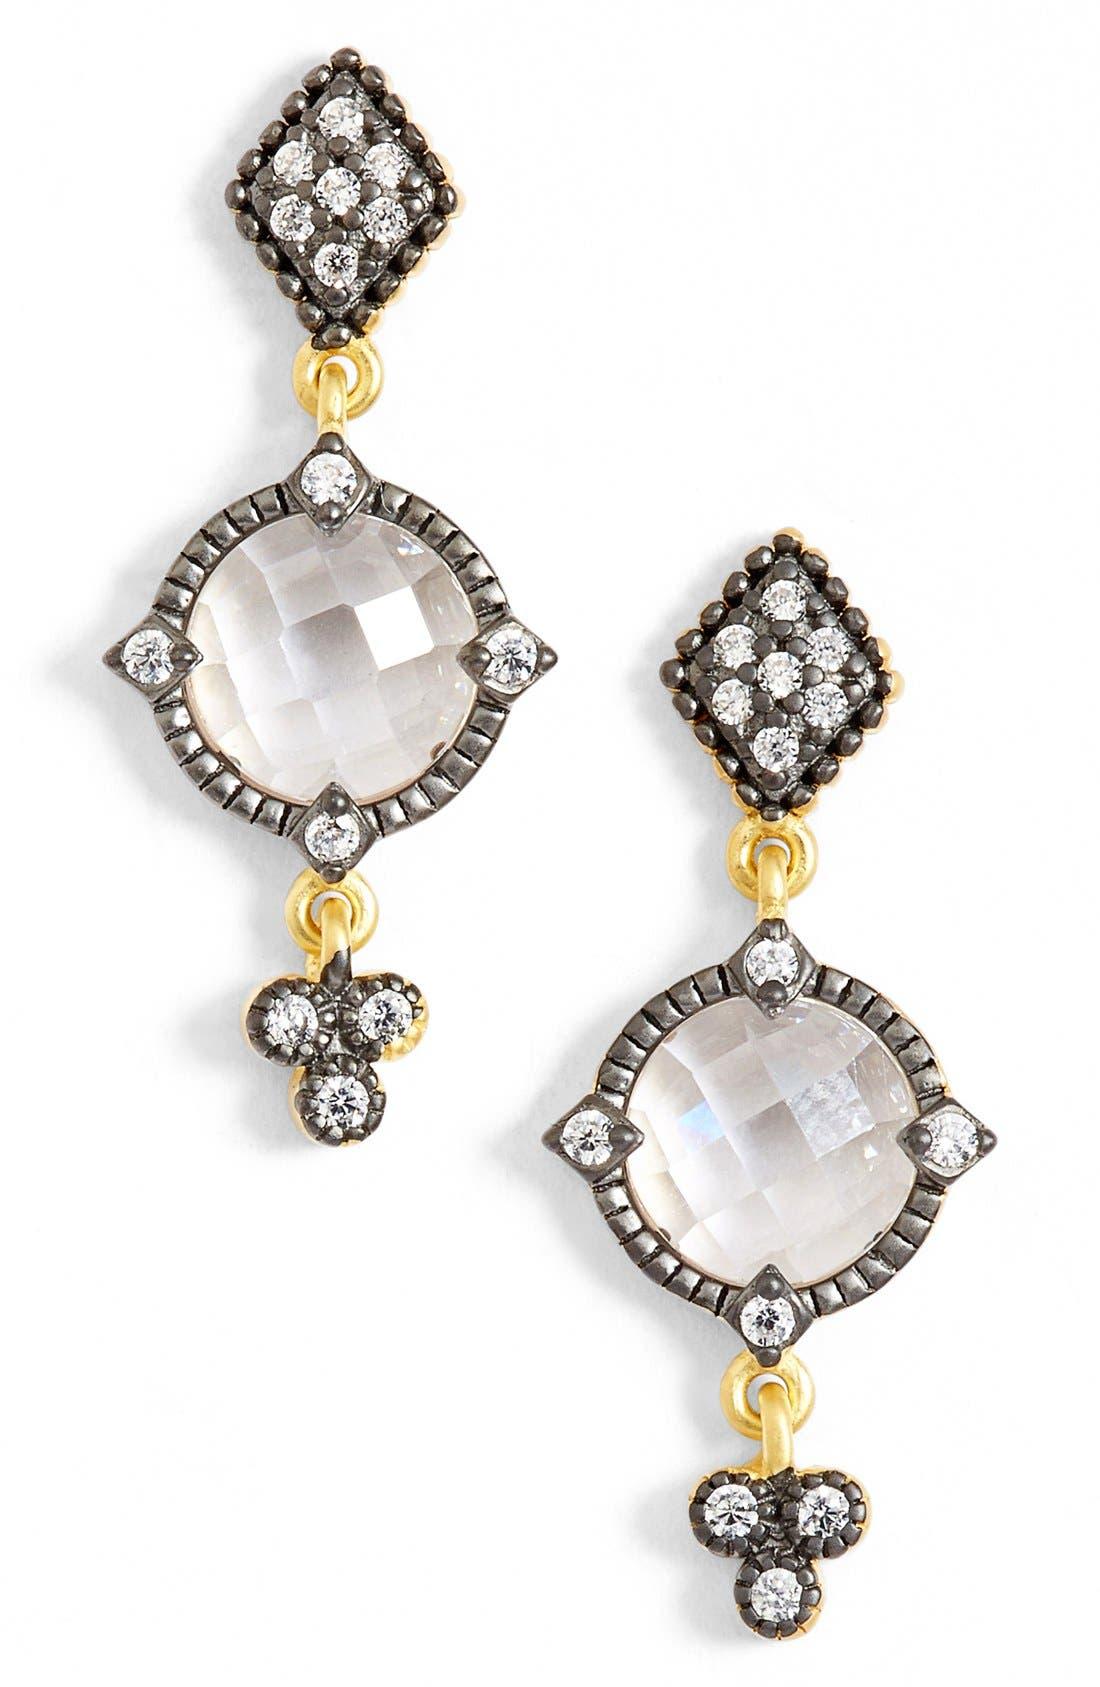 Metropolitan Drop Earrings,                             Main thumbnail 1, color,                             Gunmetal/ Clear